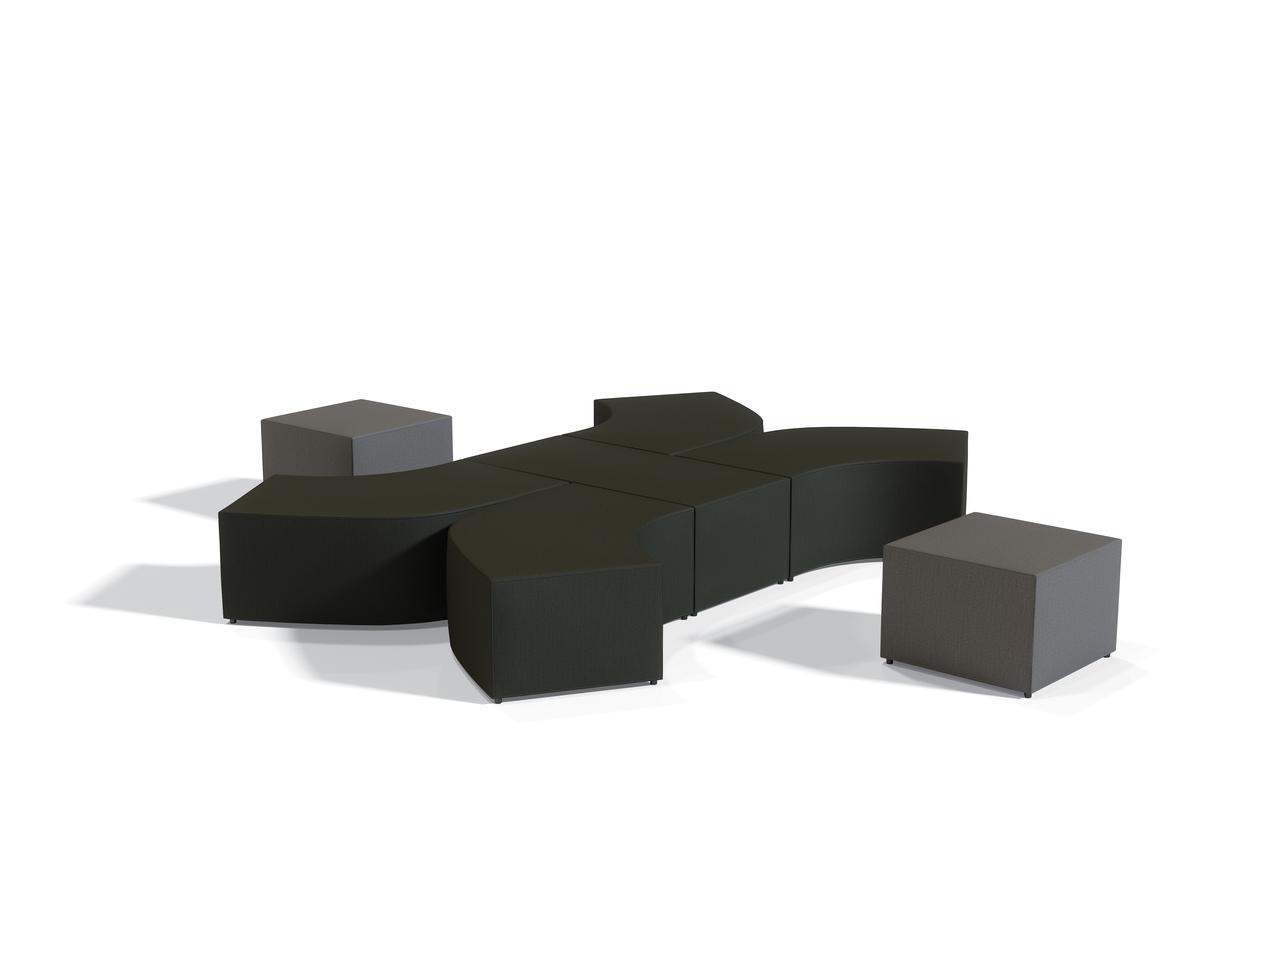 Offices To Go 7 Piece Modular Ottoman Seating Set